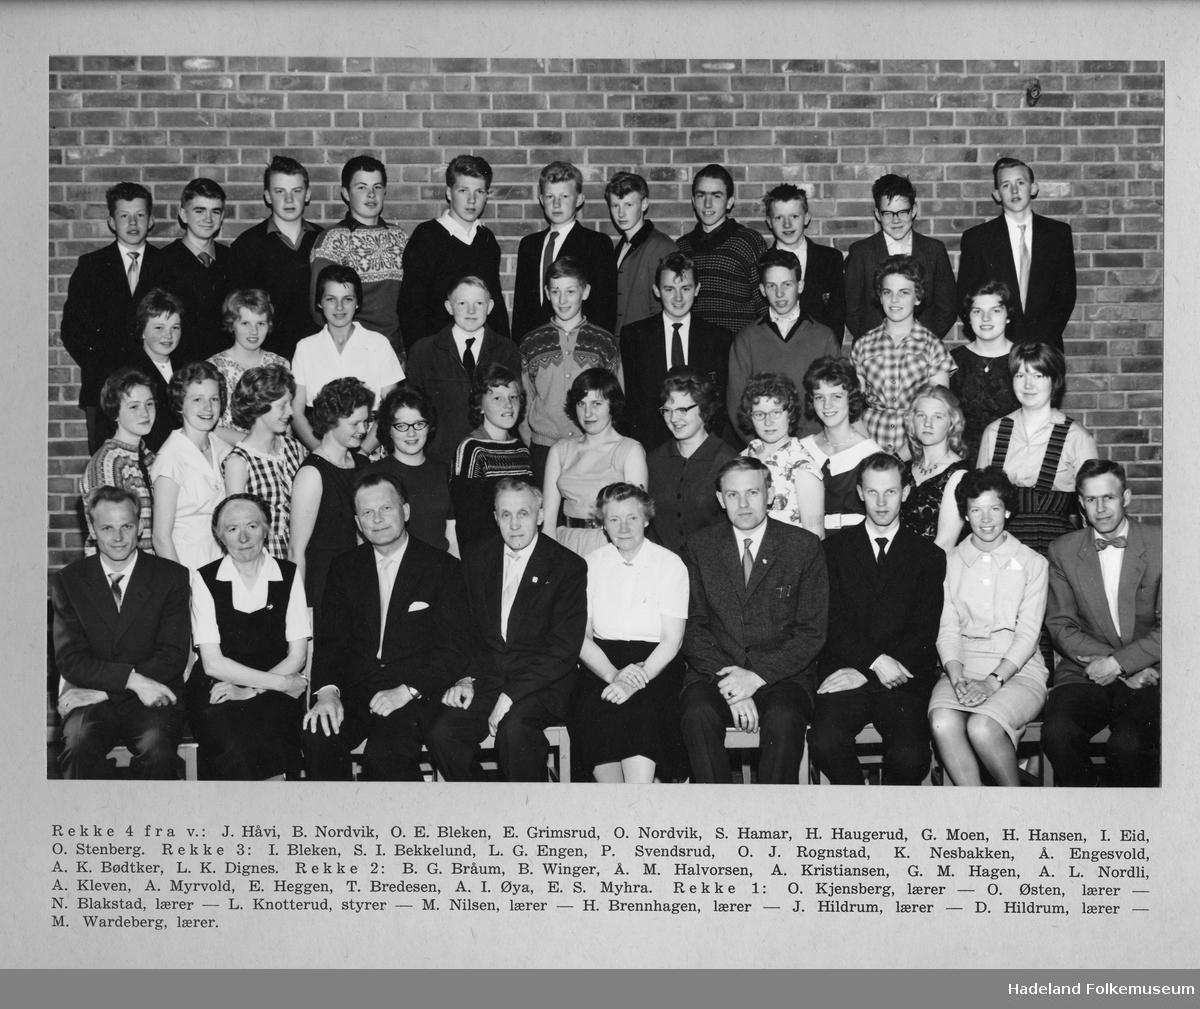 Brandbu Framhaldsskole - 9. skoleår 1960-1961